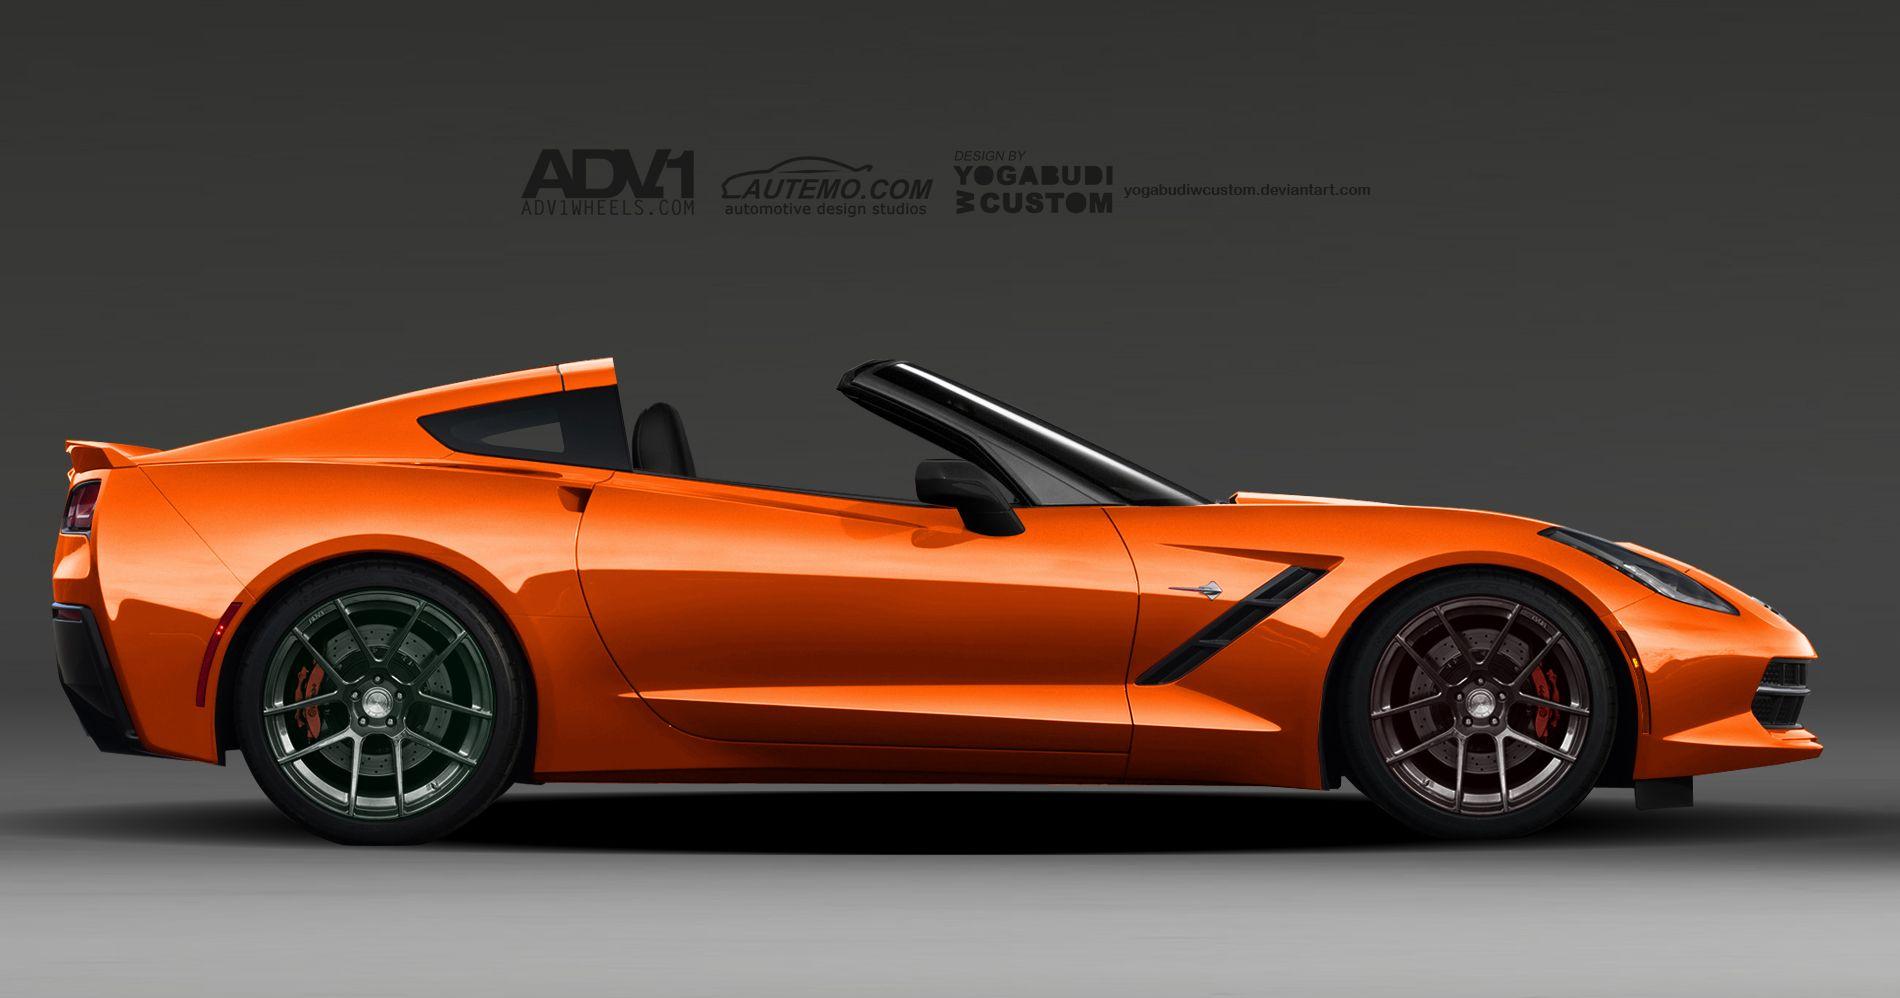 Corvette stingray c7 targa by yogabudiwcustom deviantart com on deviantart